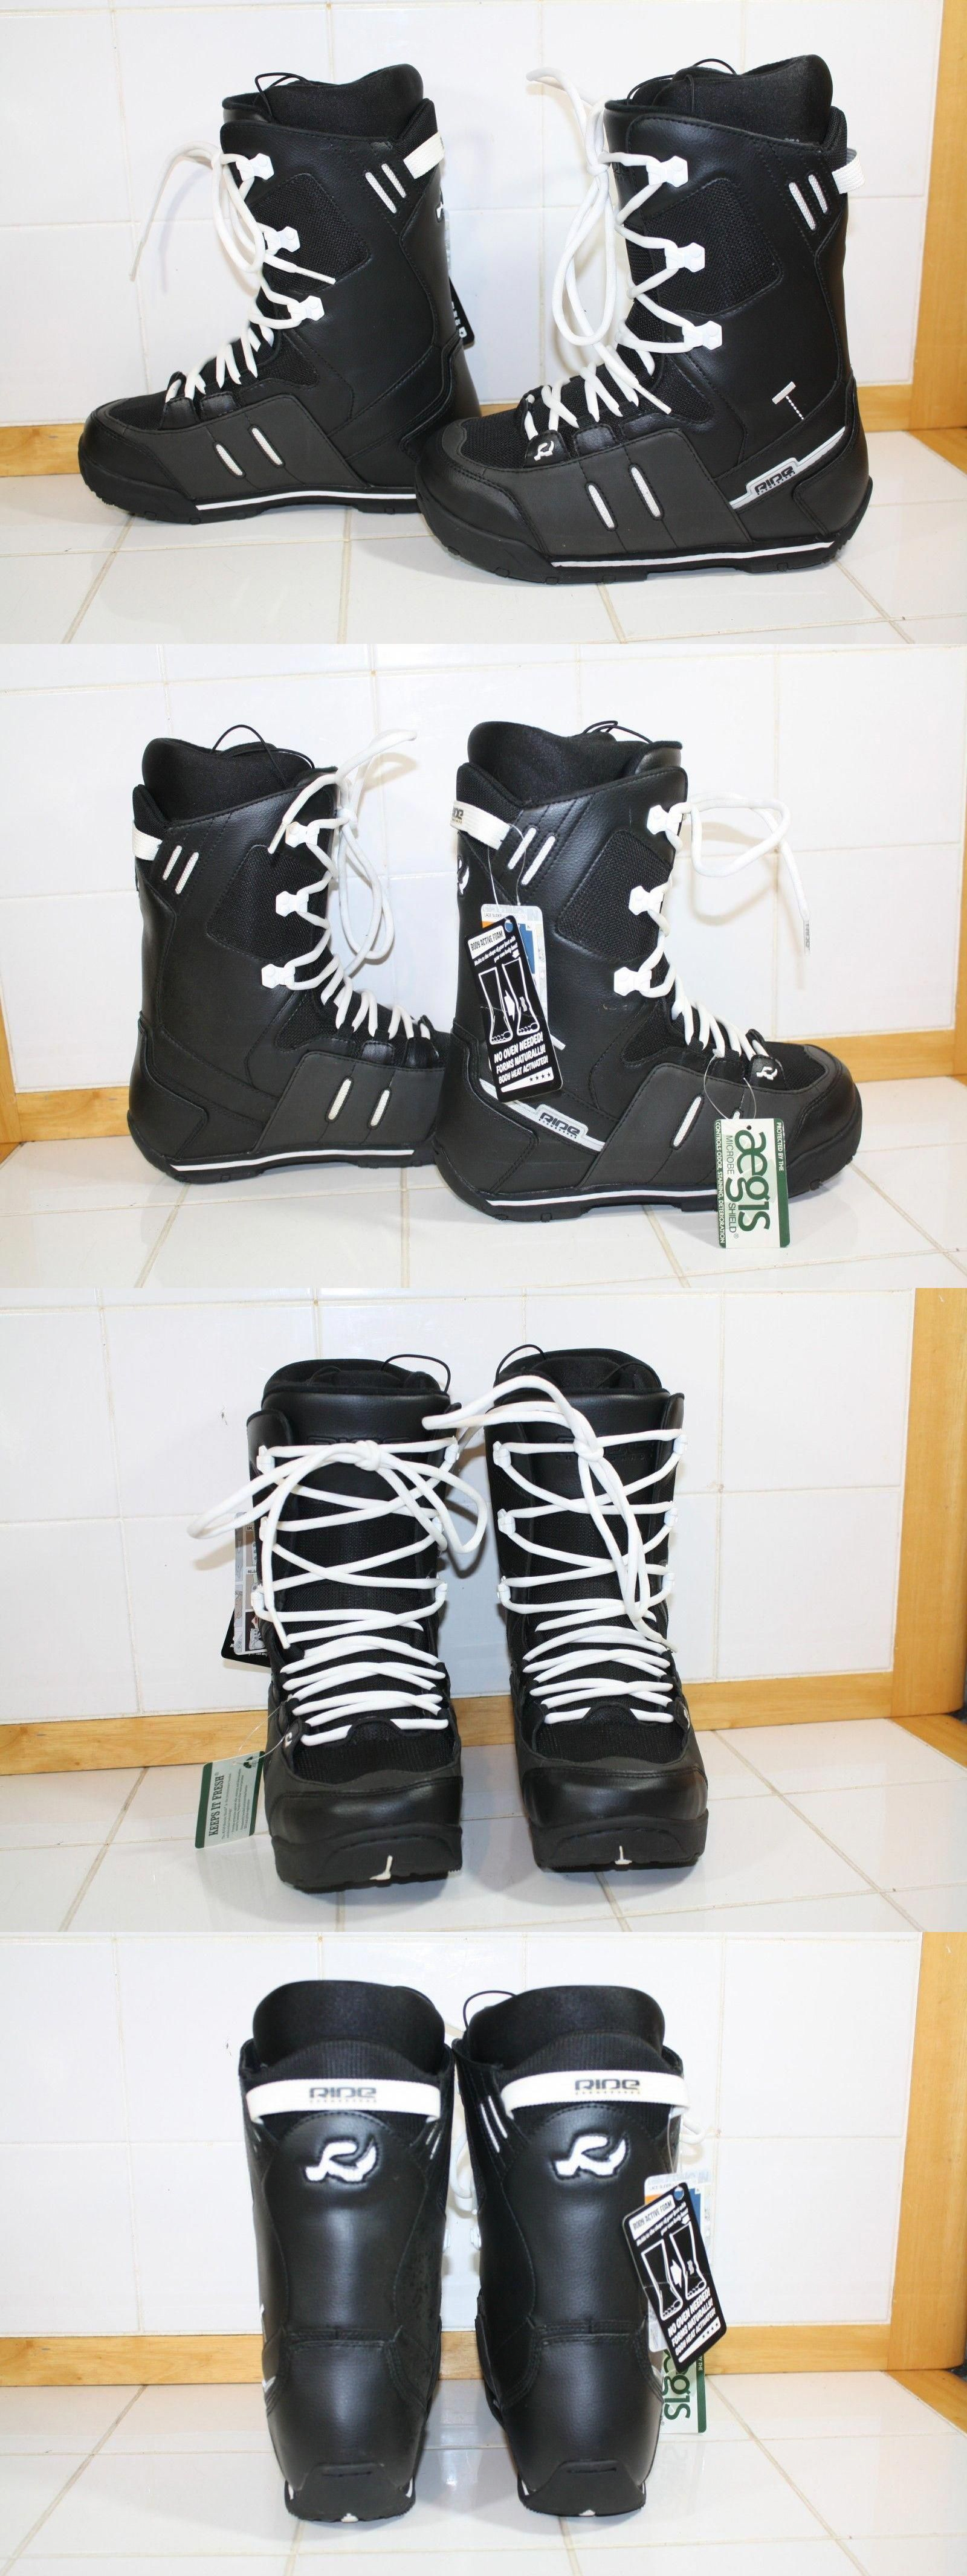 sale retailer 46a83 3b134 Boots 36292 Men S Ride Orion Snowboard Boots Size 8 - BUY IT NOW